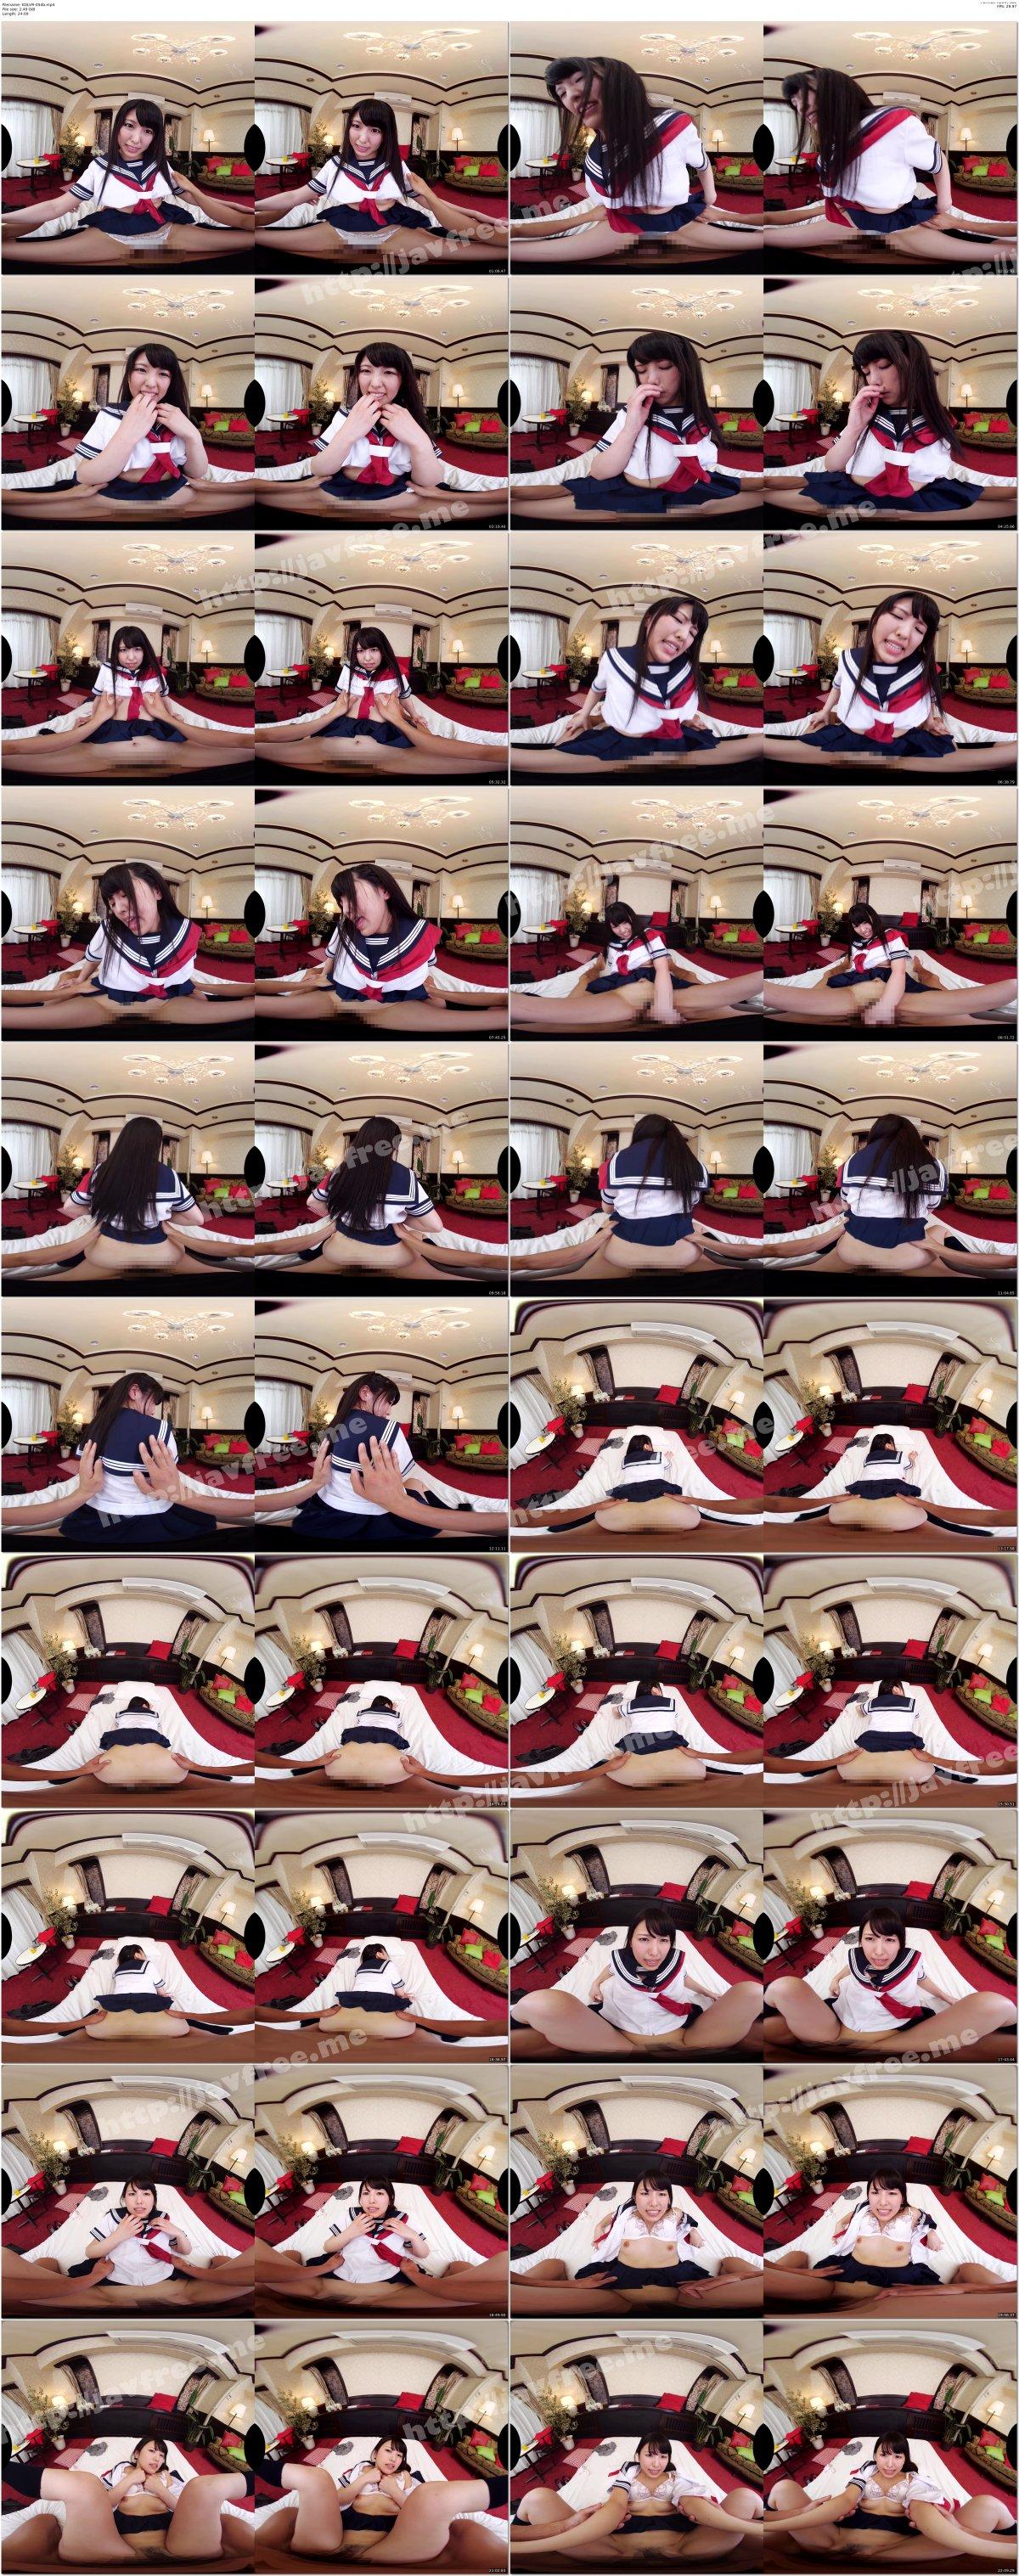 [KOLVR-054] 【VR】お気に入り嬢は『倉木しおり』 内緒で本番!J○制服リフレ - image KOLVR-054b on https://javfree.me